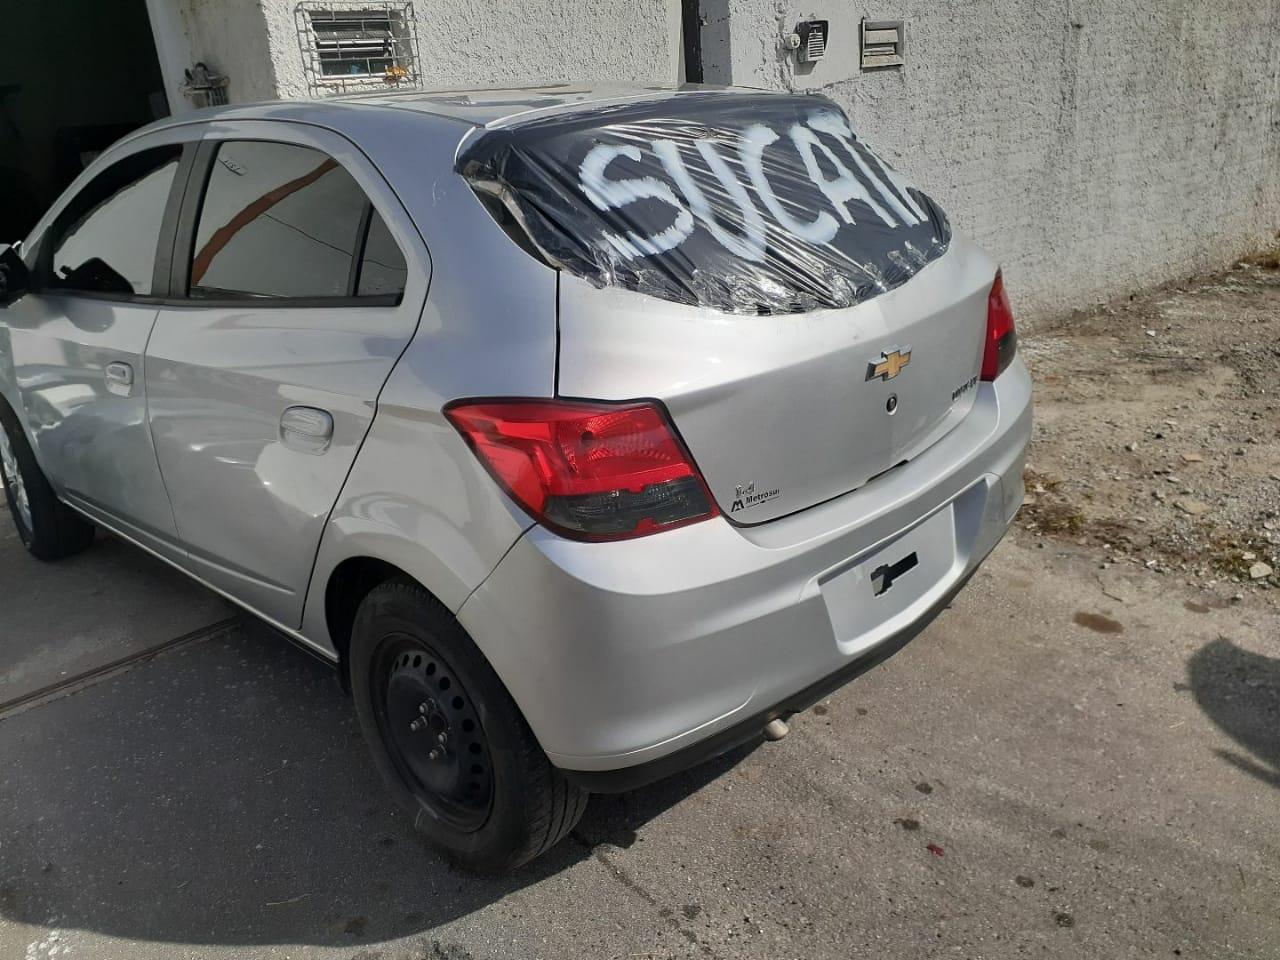 SUCATA GM - CHEVROLET ONIX 2014 1.4 8V